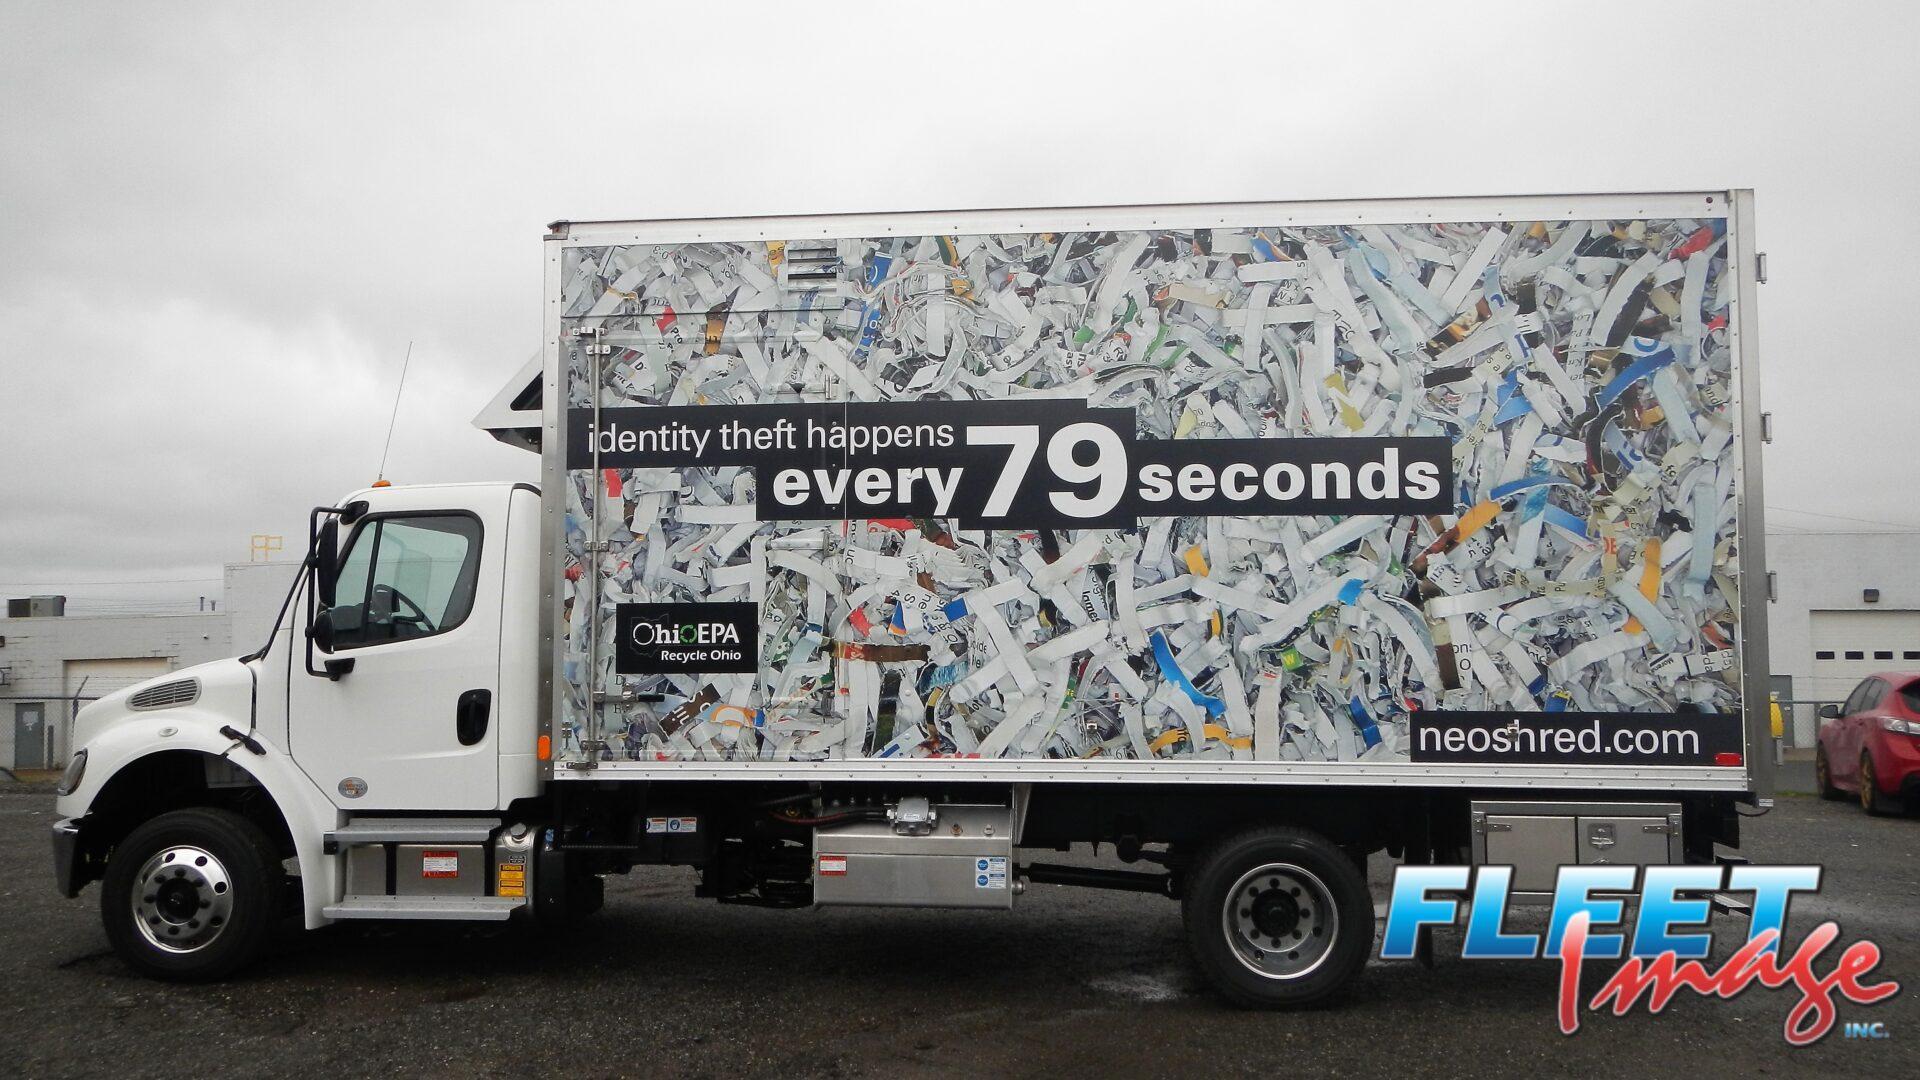 neoshred.com decal sticker on a truck